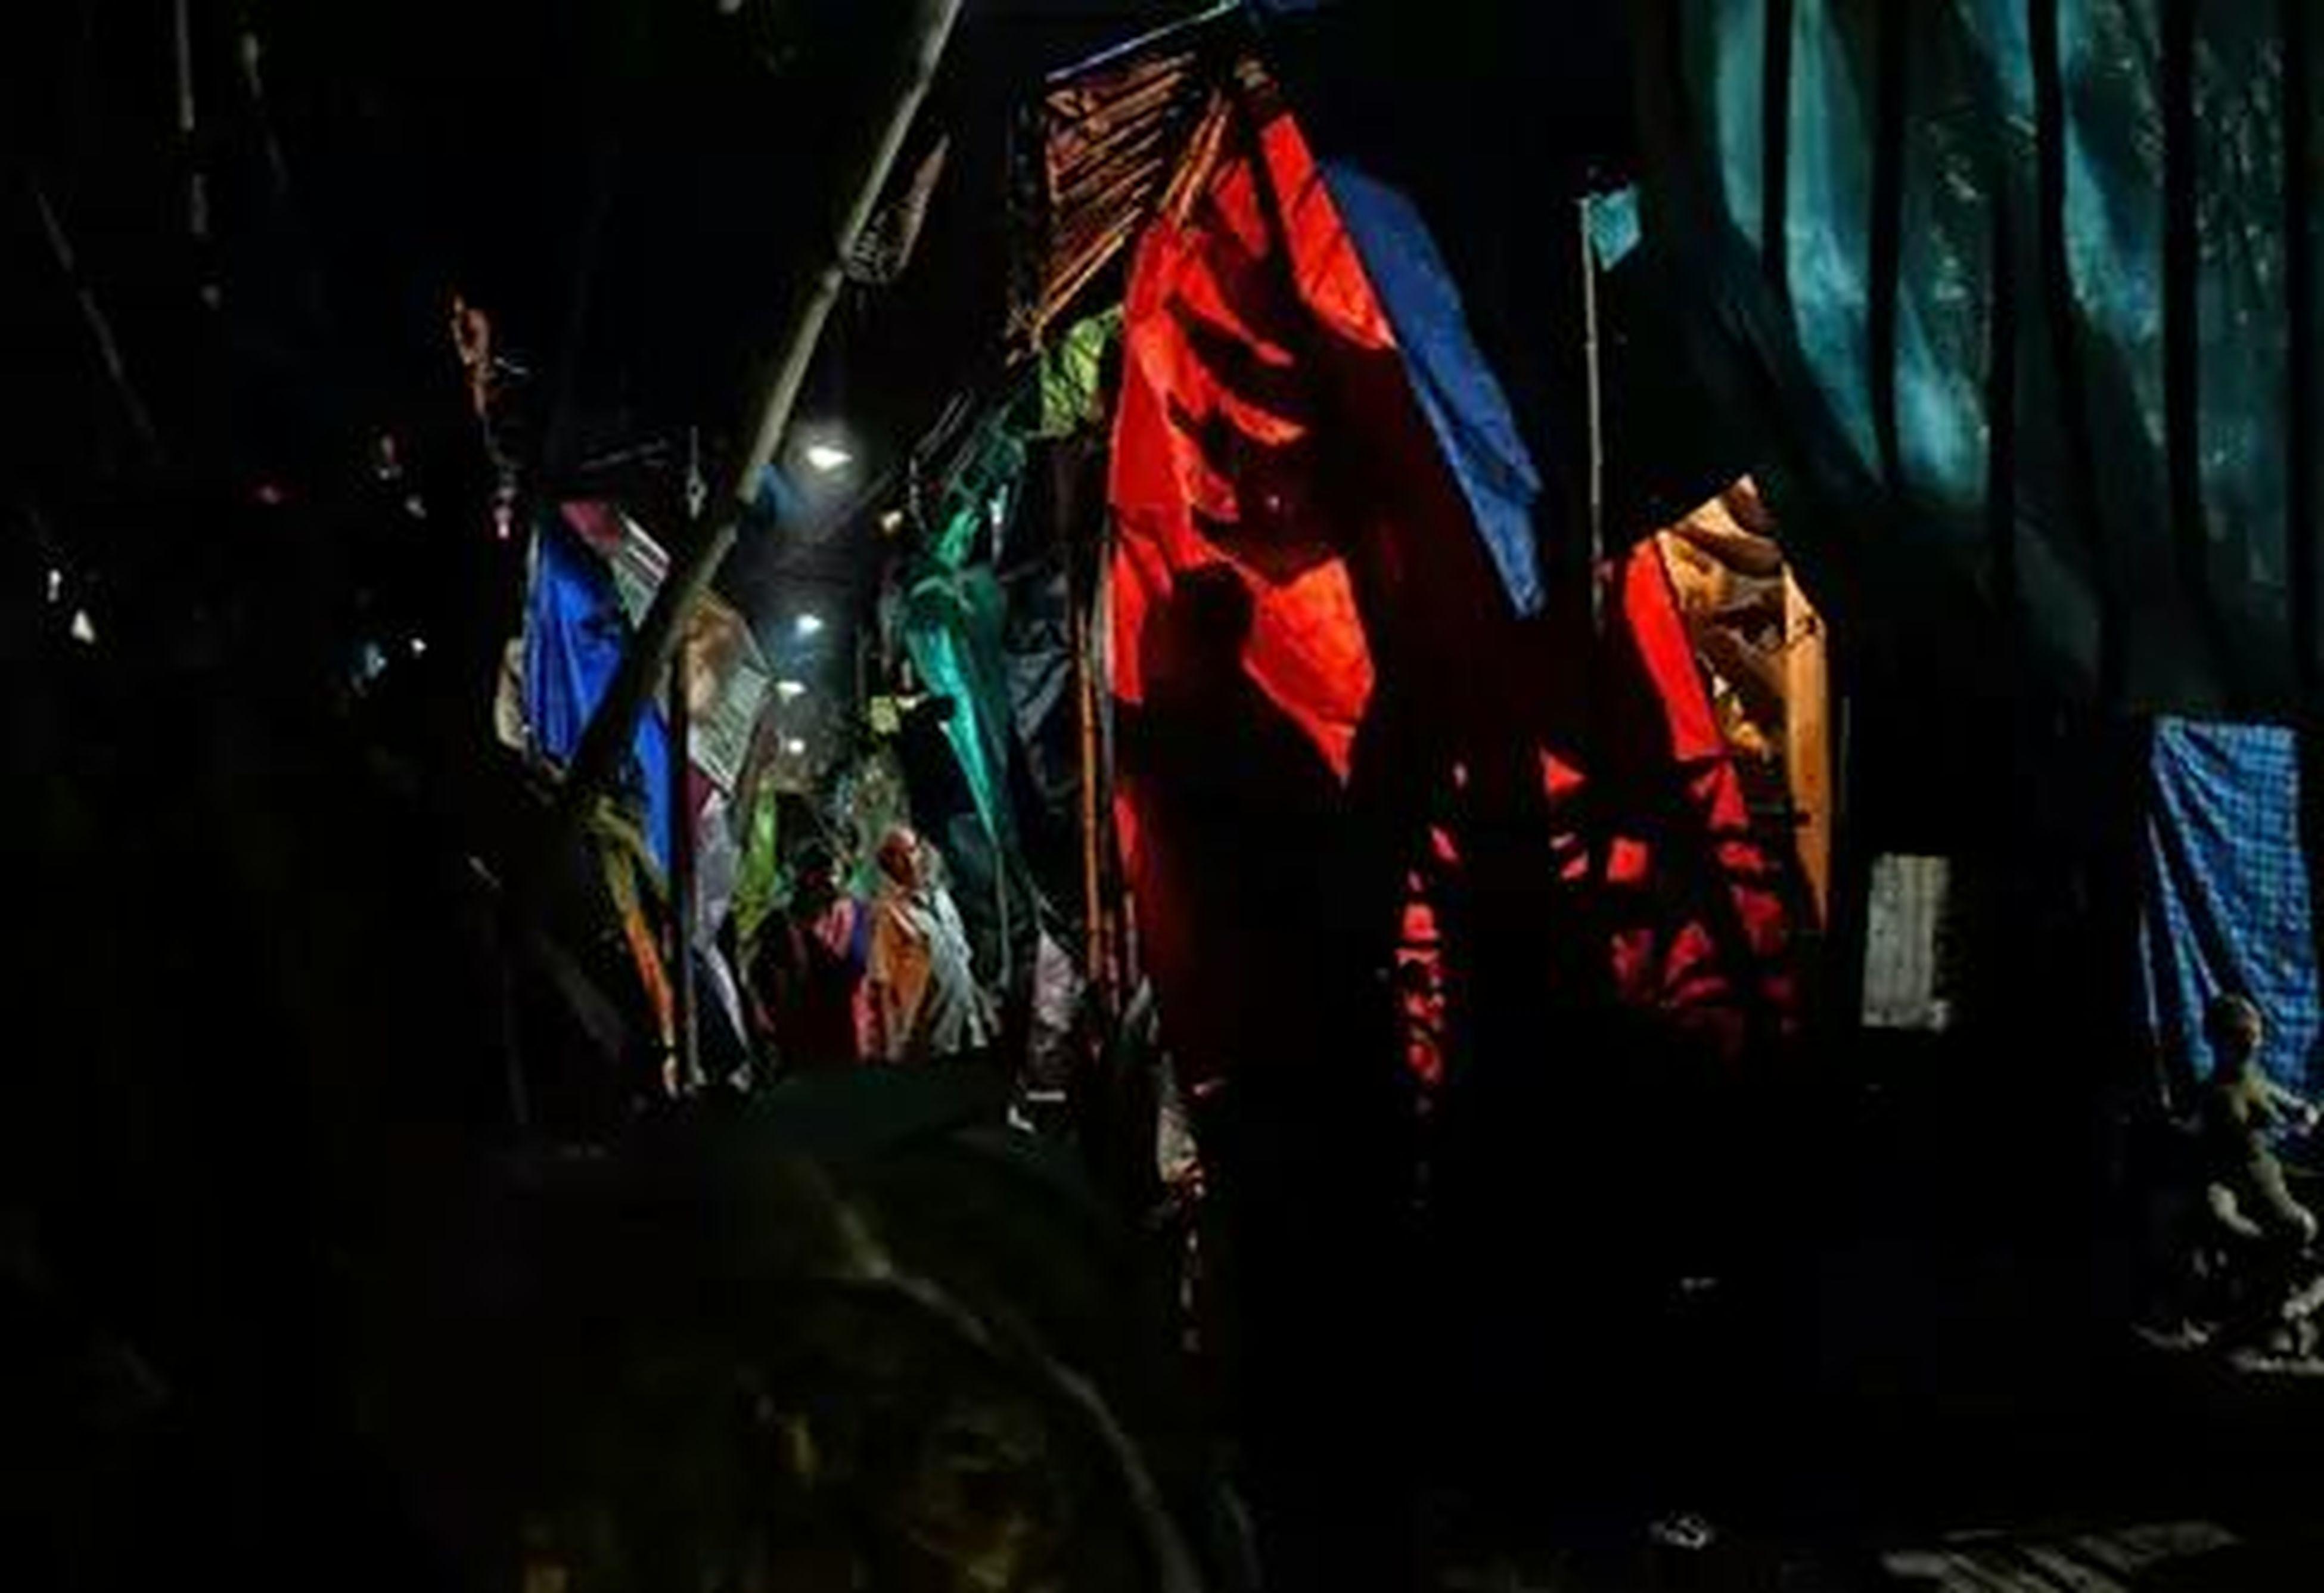 night, illuminated, multi colored, lighting equipment, street, flag, art, red, art and craft, creativity, dark, celebration, built structure, outdoors, city, light - natural phenomenon, building exterior, human representation, decoration, hanging